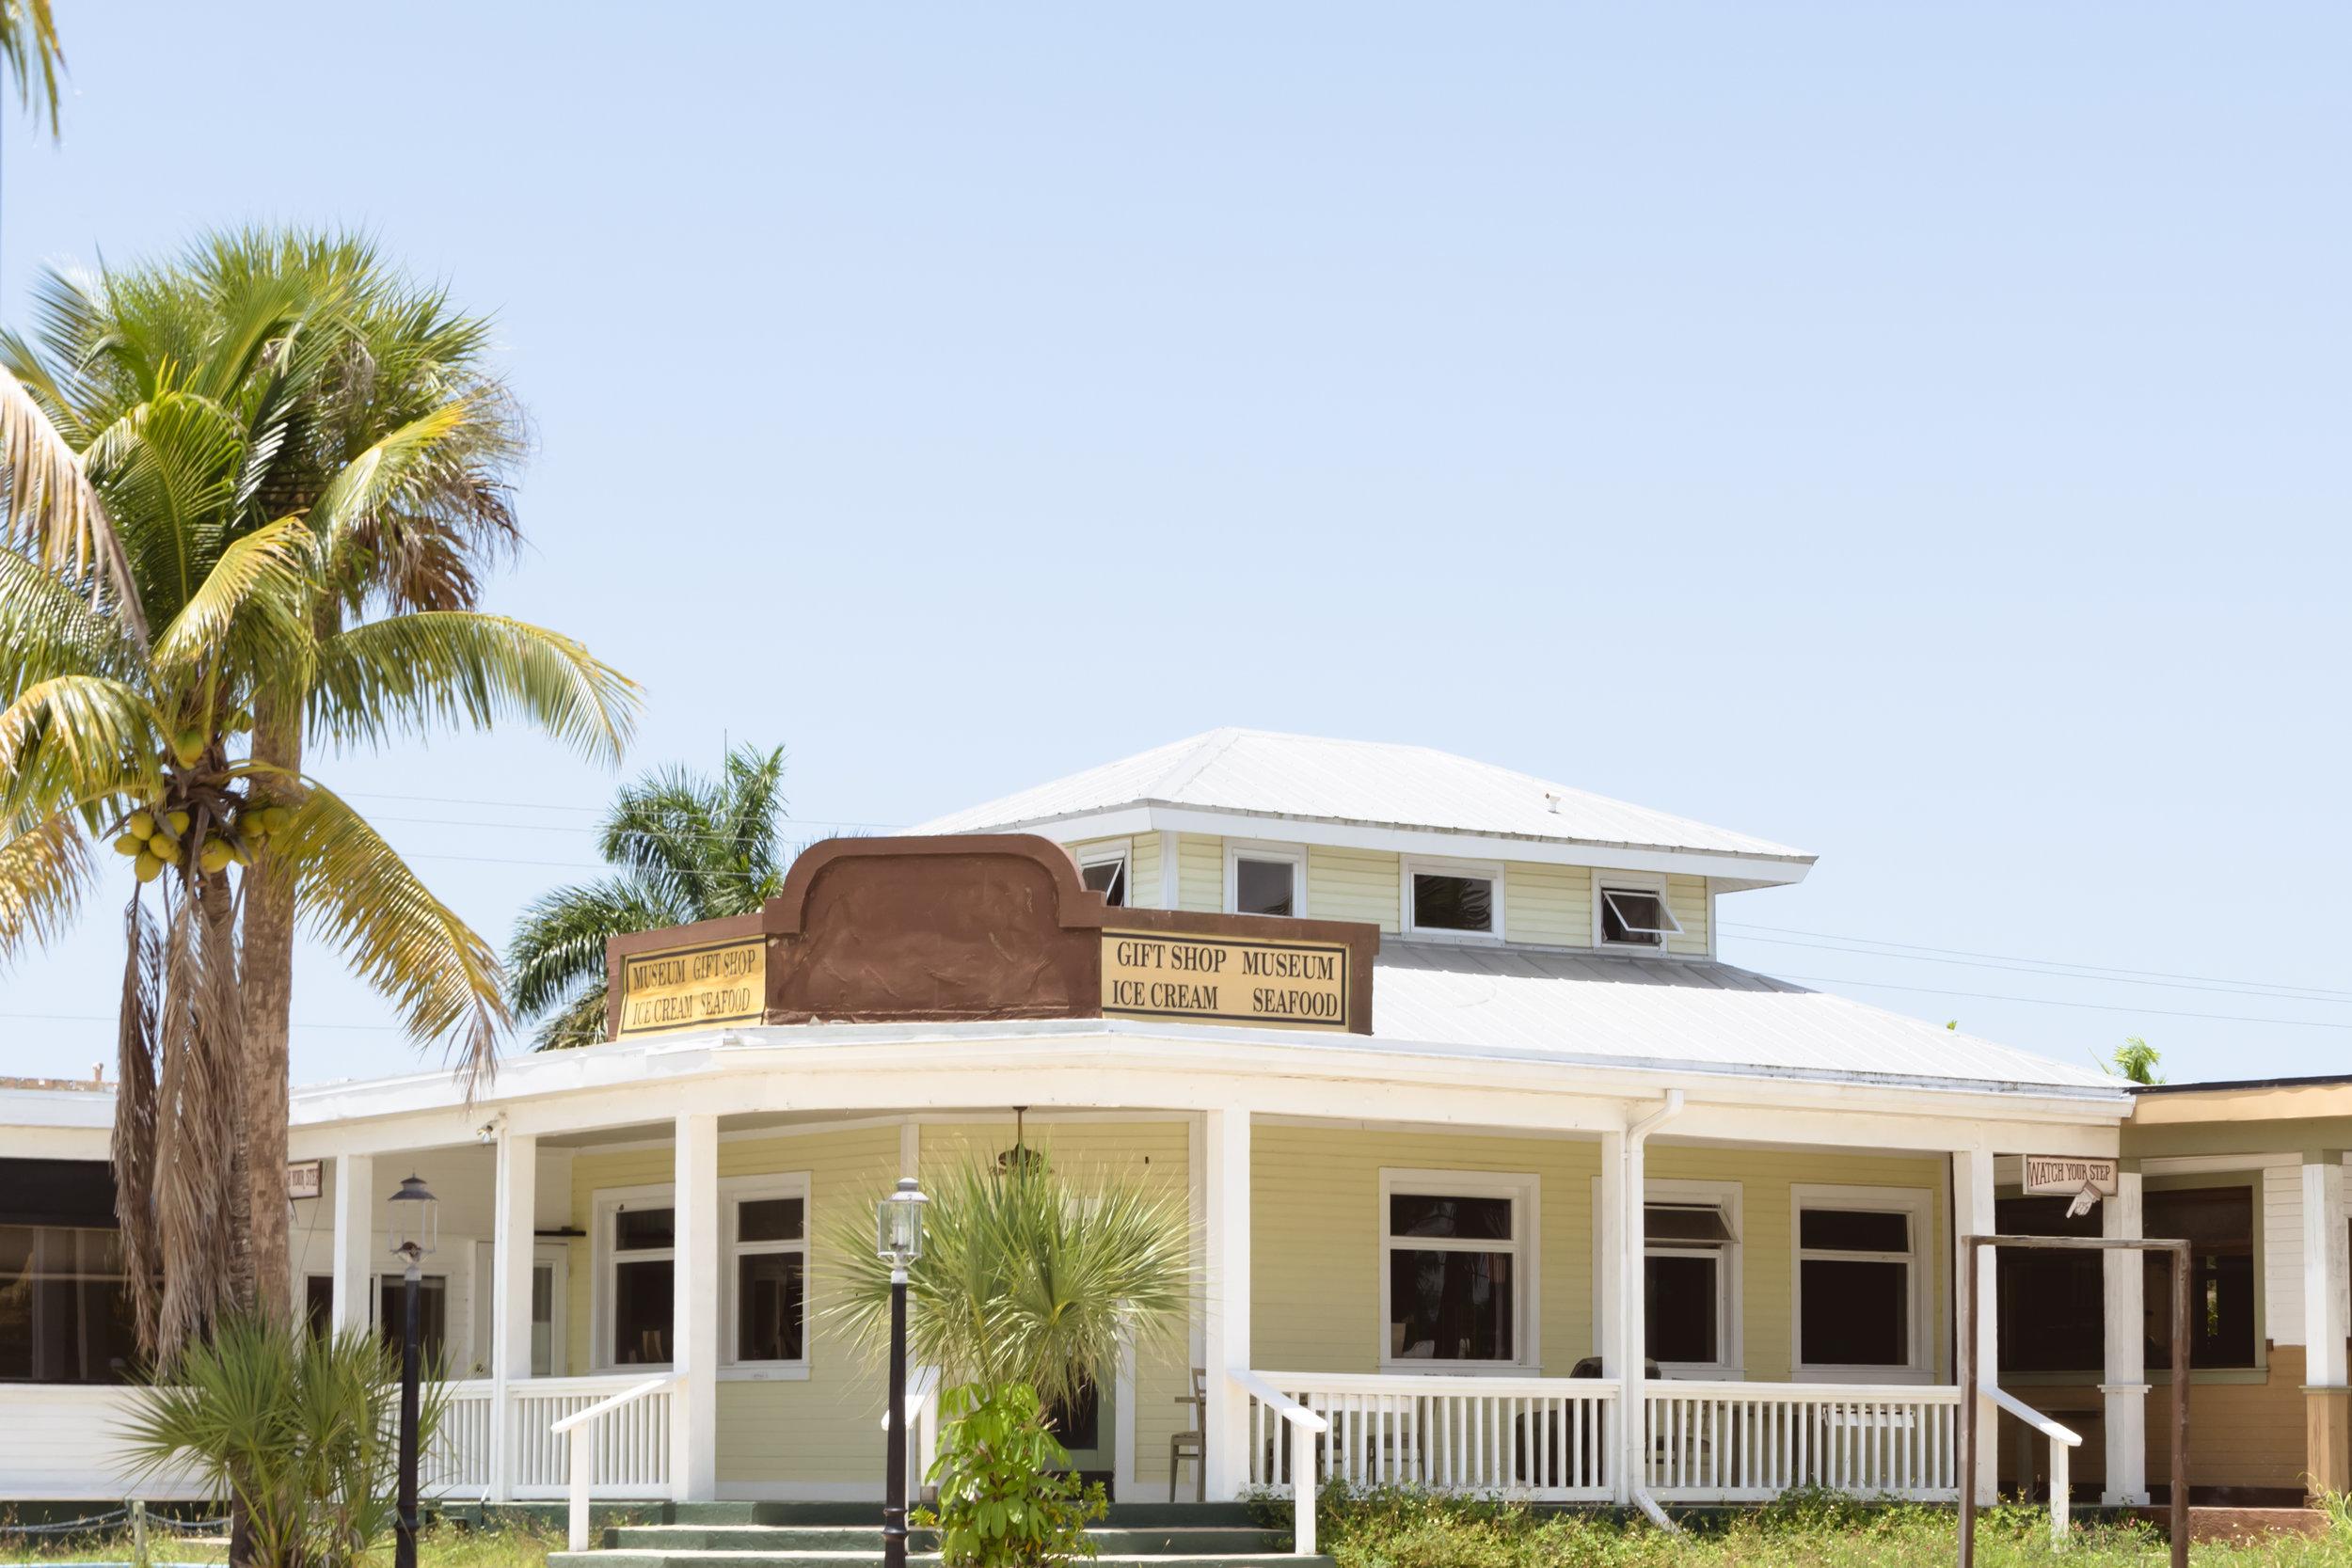 south-west-florida-traveling-to-the-everglades-orlando-travel-photographer-yanitza-ninett-7.jpg